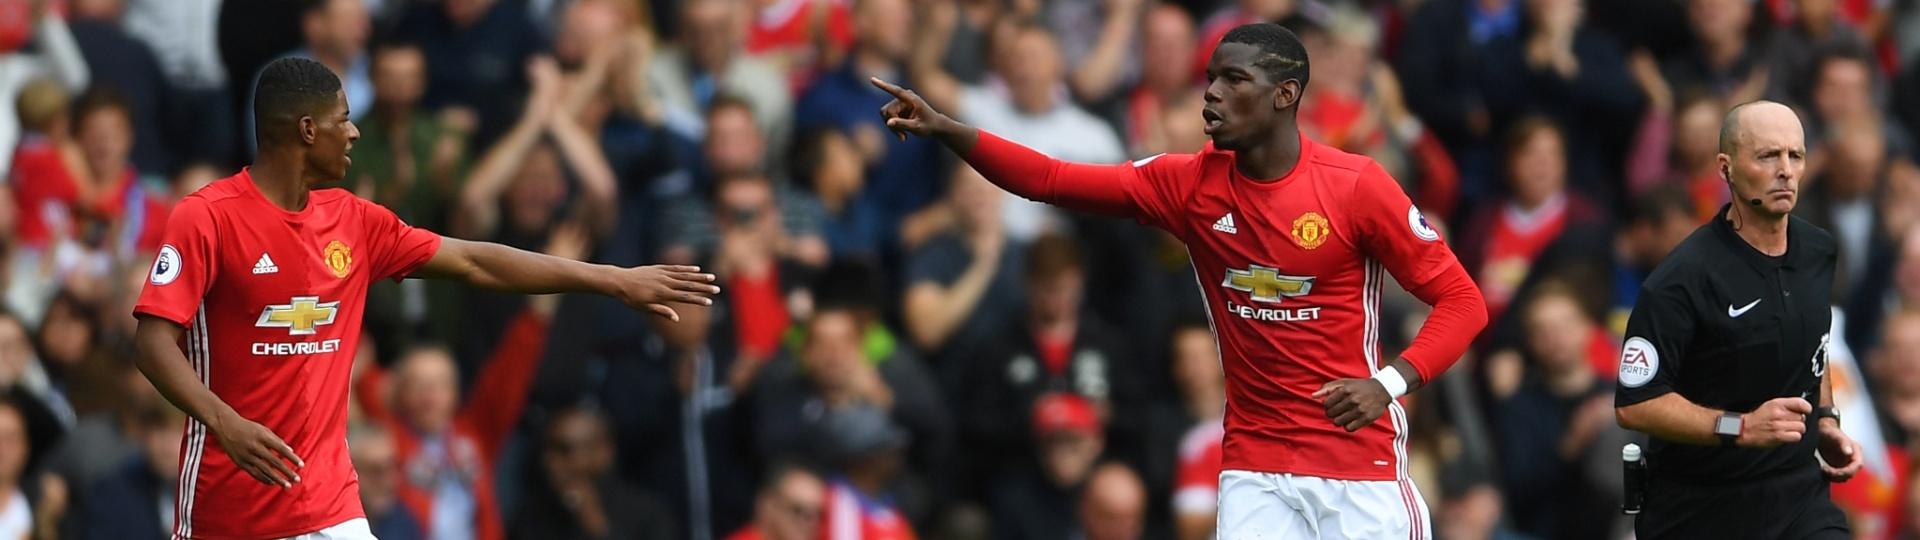 Pogba comemora gol do United contra o Leicester